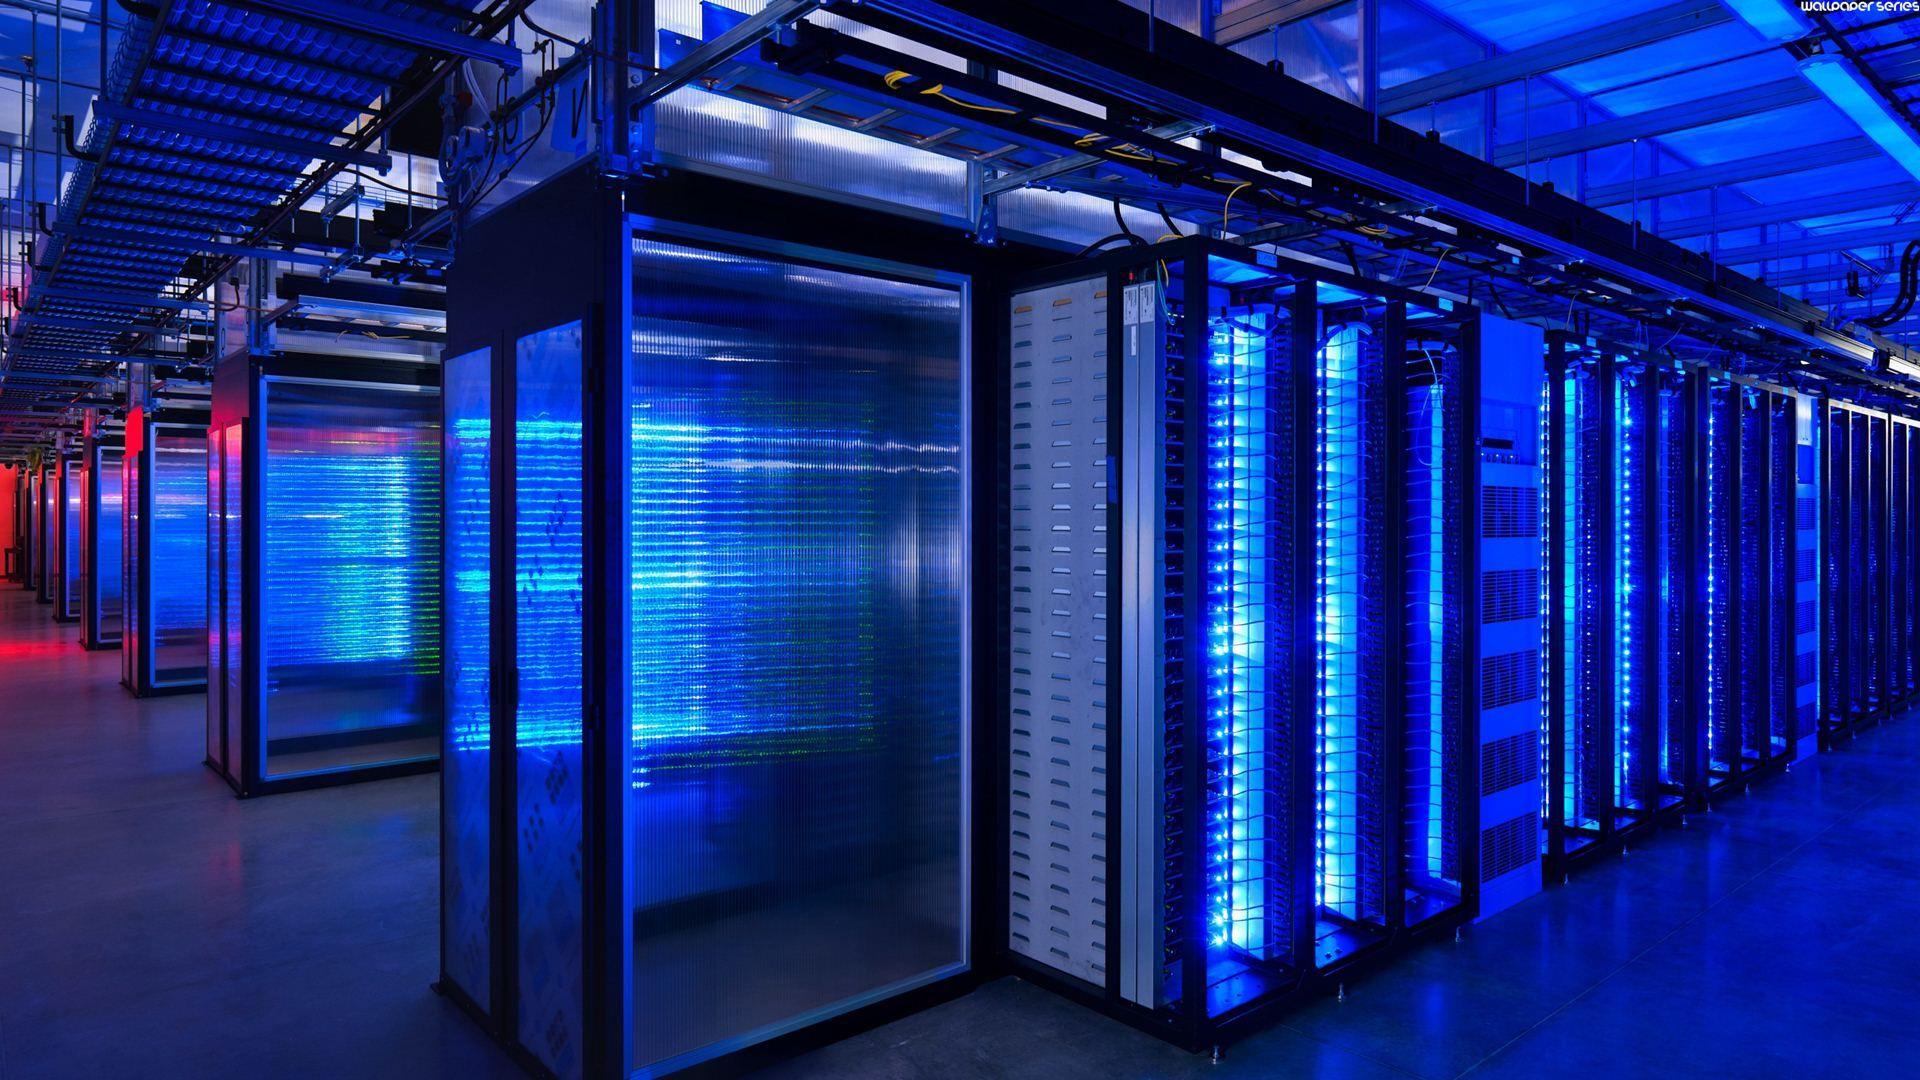 Servers - Windows Server 2003 End